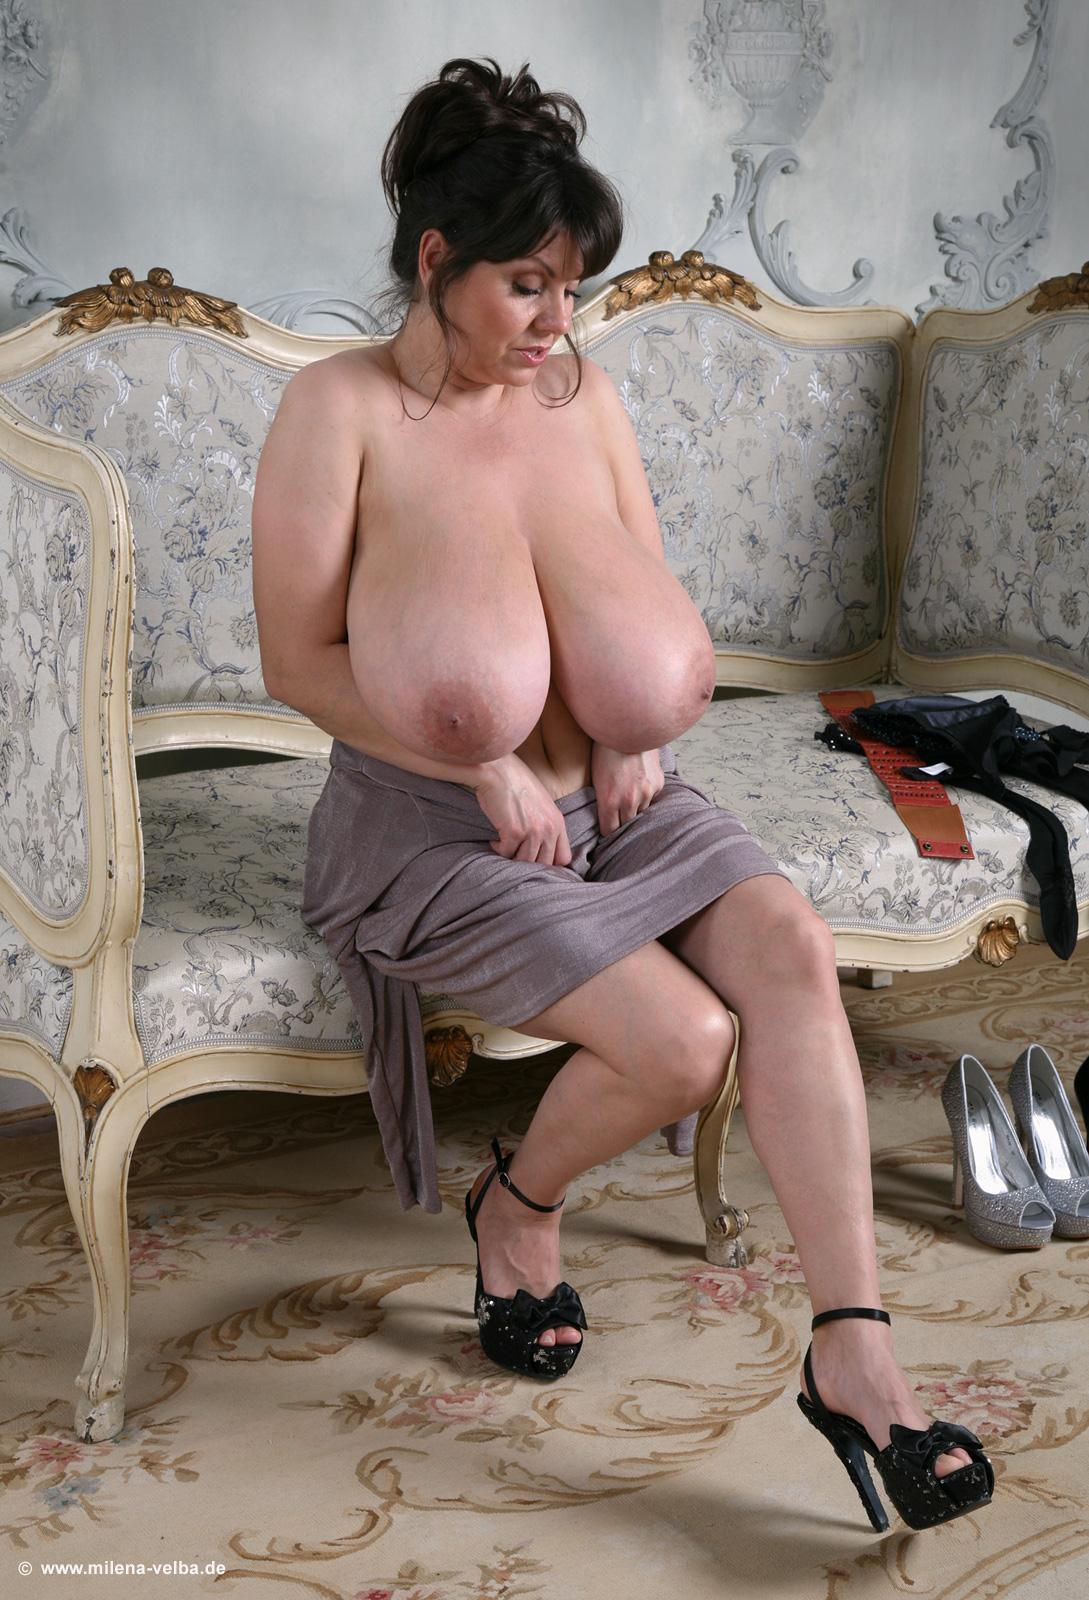 Udderly Amazing: Milena Velba - This One P1 &P2